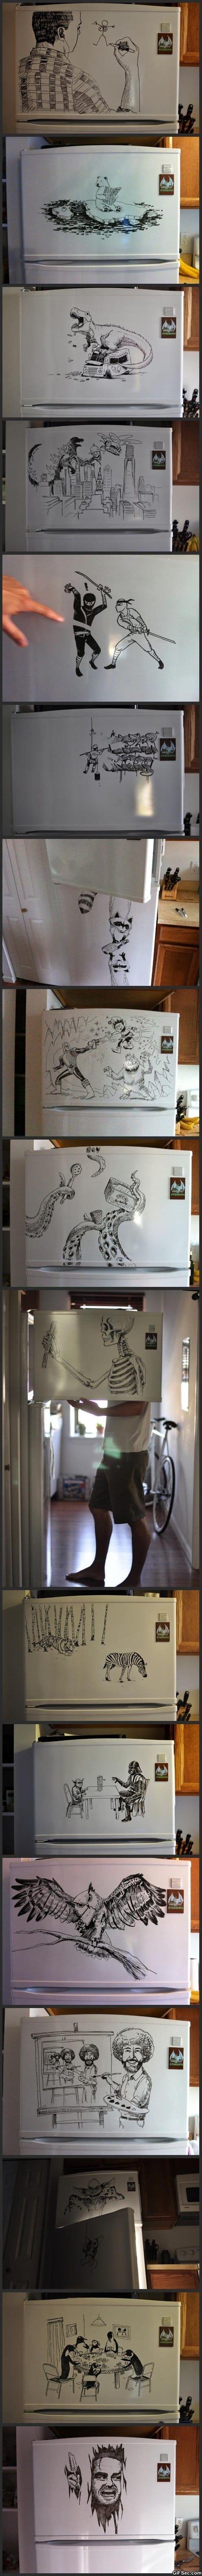 Freezer Art